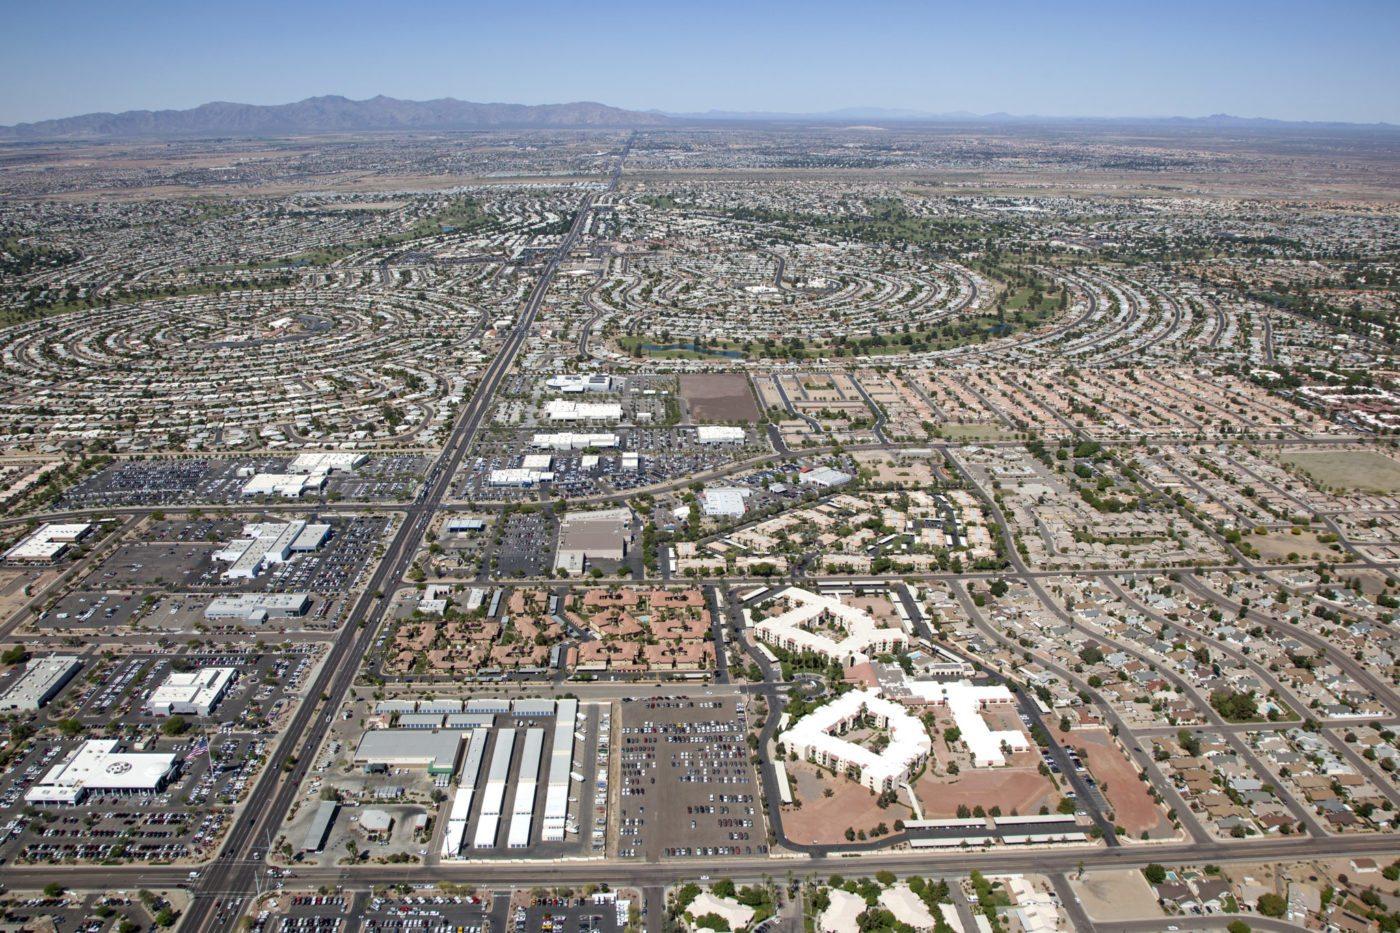 Coldwell Banker Residential Brokerage acquires 250-agent Sun City, Ariz., brokerage, Ken Meade Realty